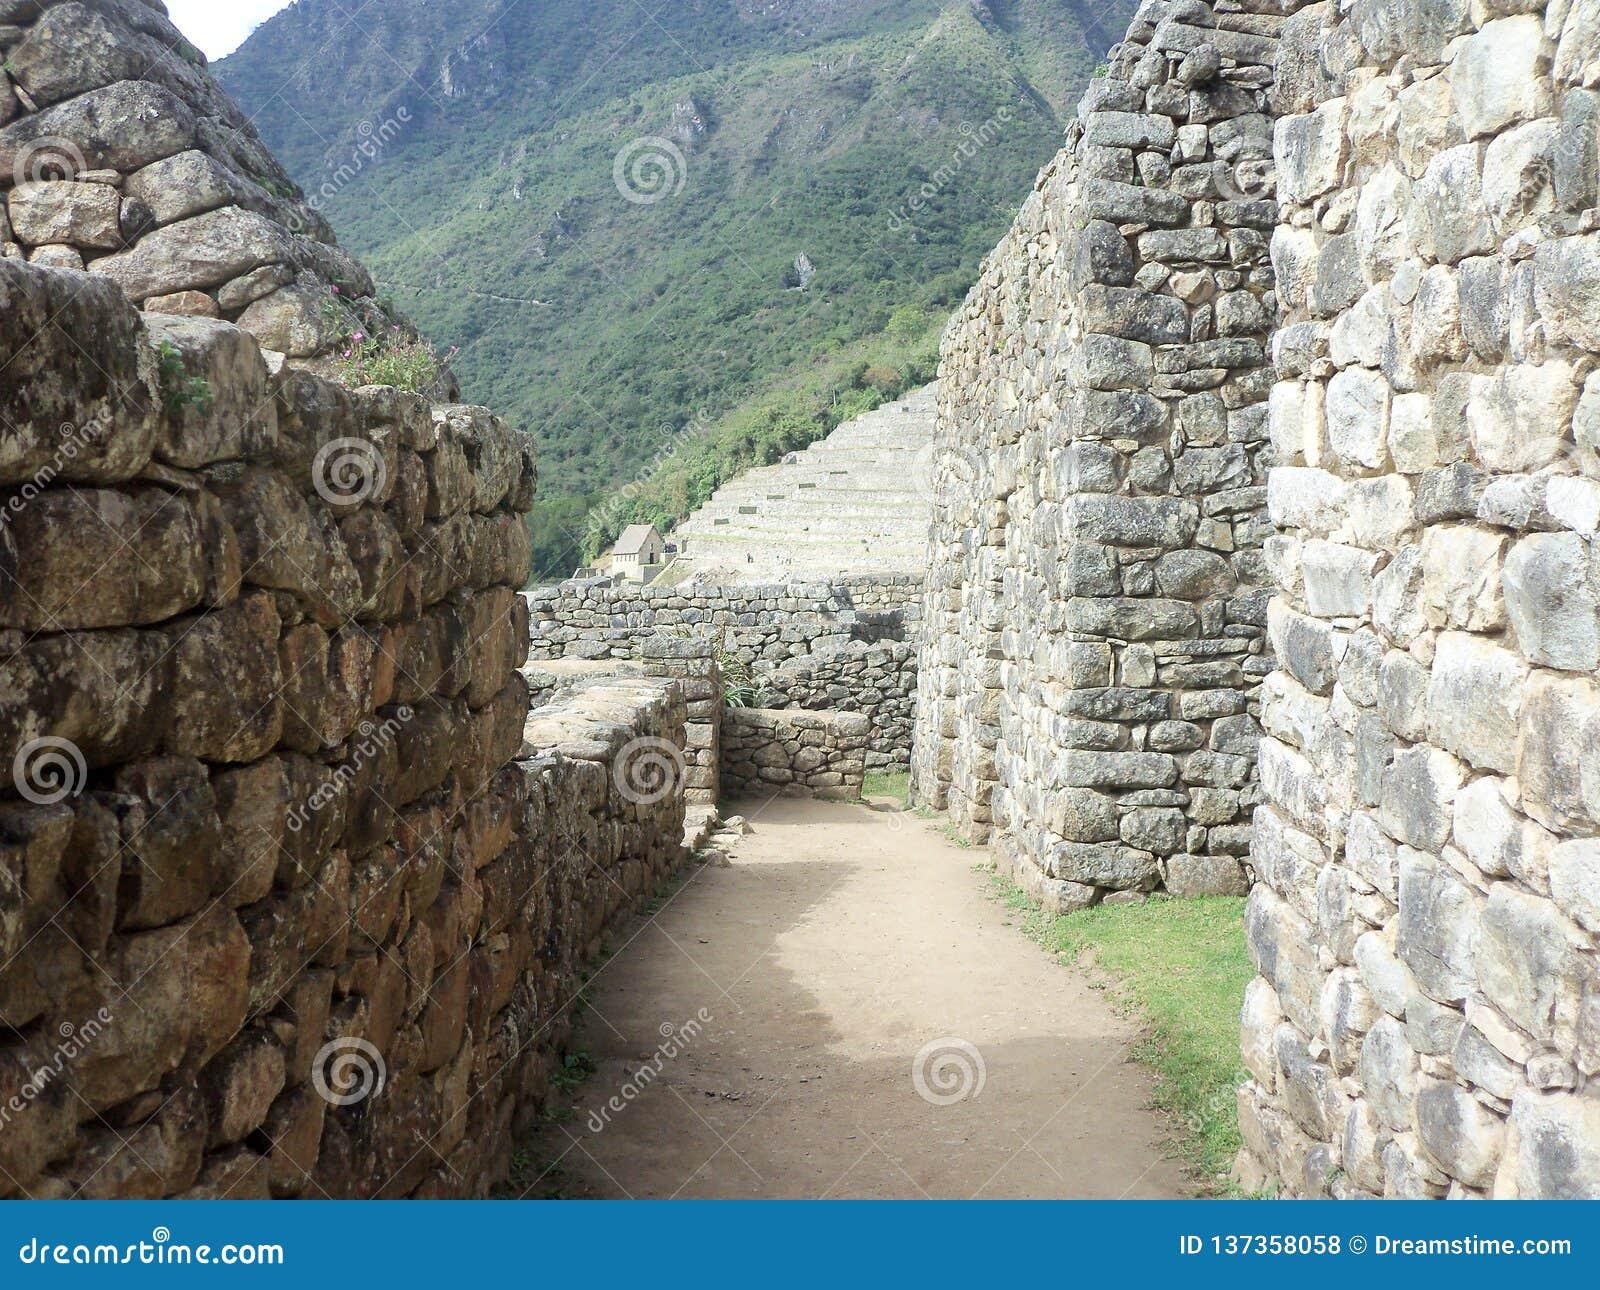 Through the corridors of Machu Picchu. In the great Inca citadel, located, Cusco.